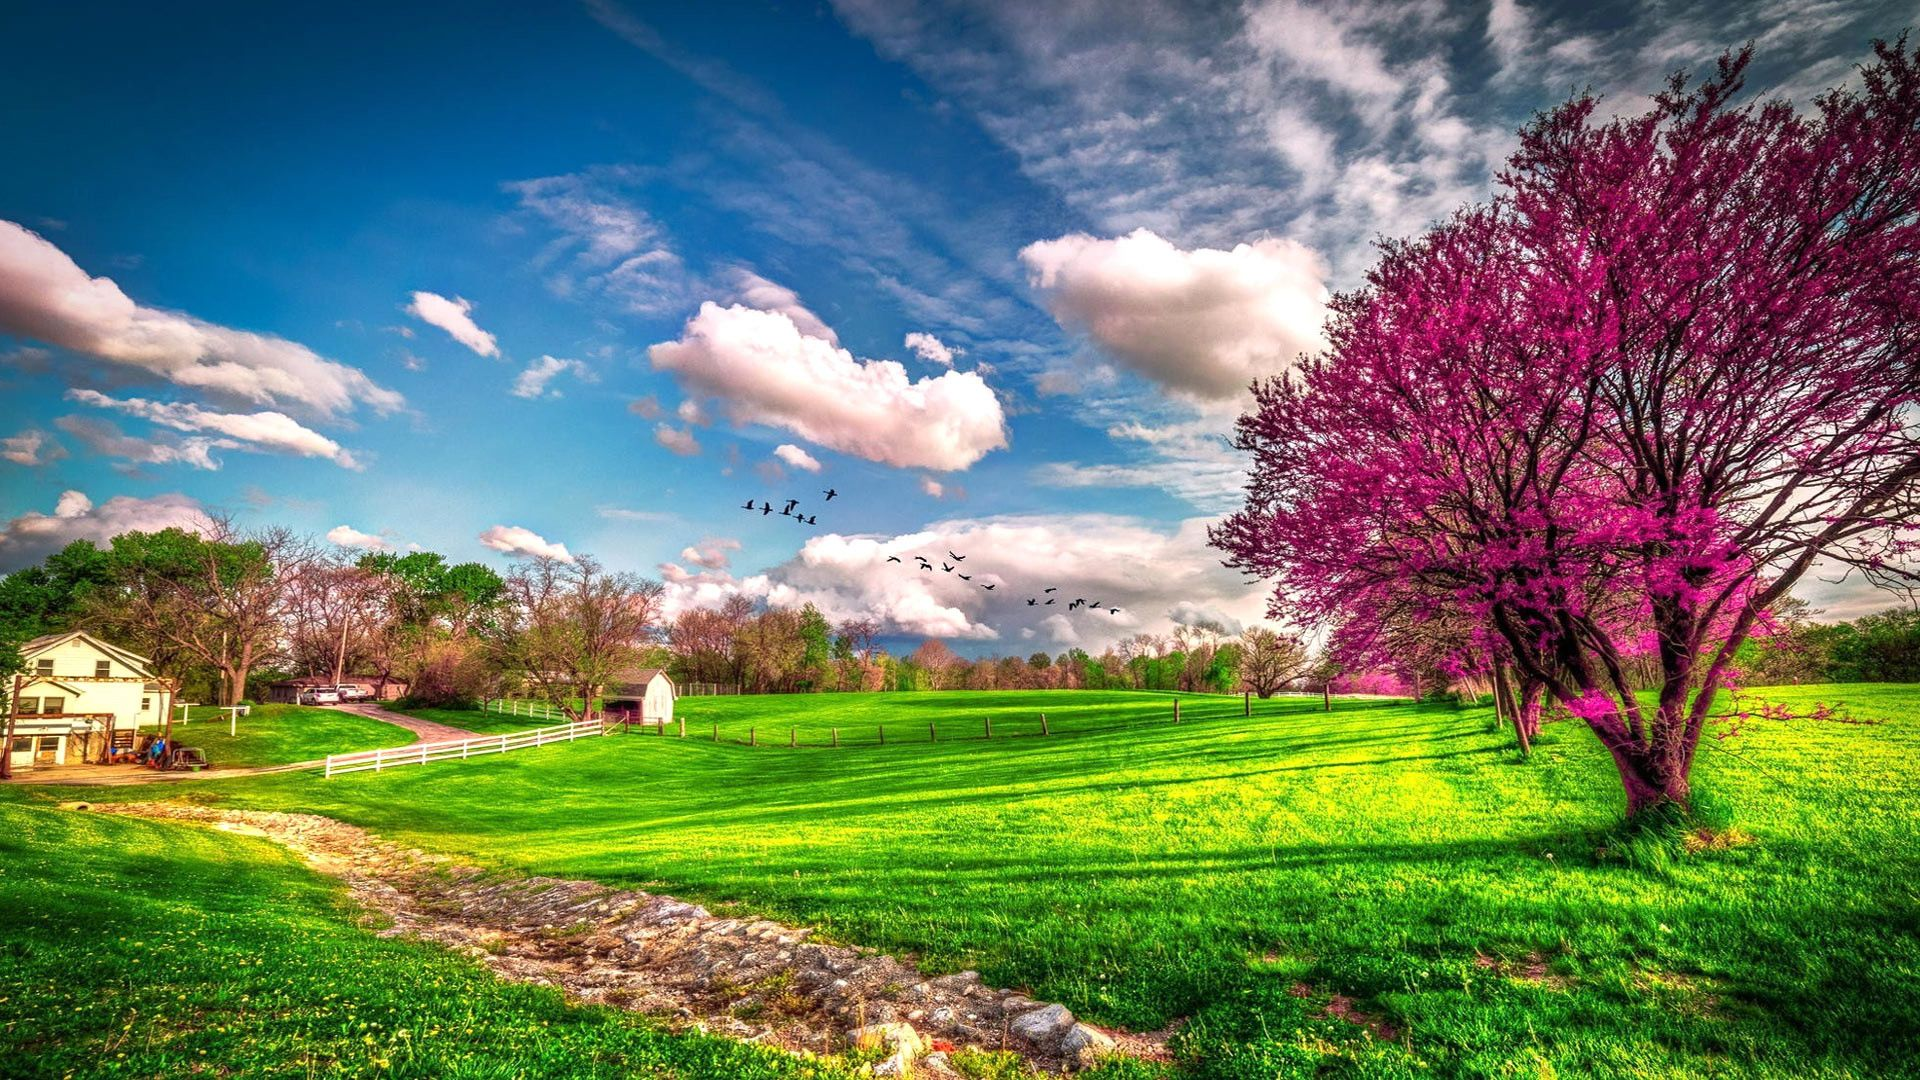 Landscape Beautiful Spring Nature Spring Wallpapers Seasons Wallpapers Download Beautiful Hd W Scenery Wallpaper Spring Wallpaper Spring Desktop Wallpaper